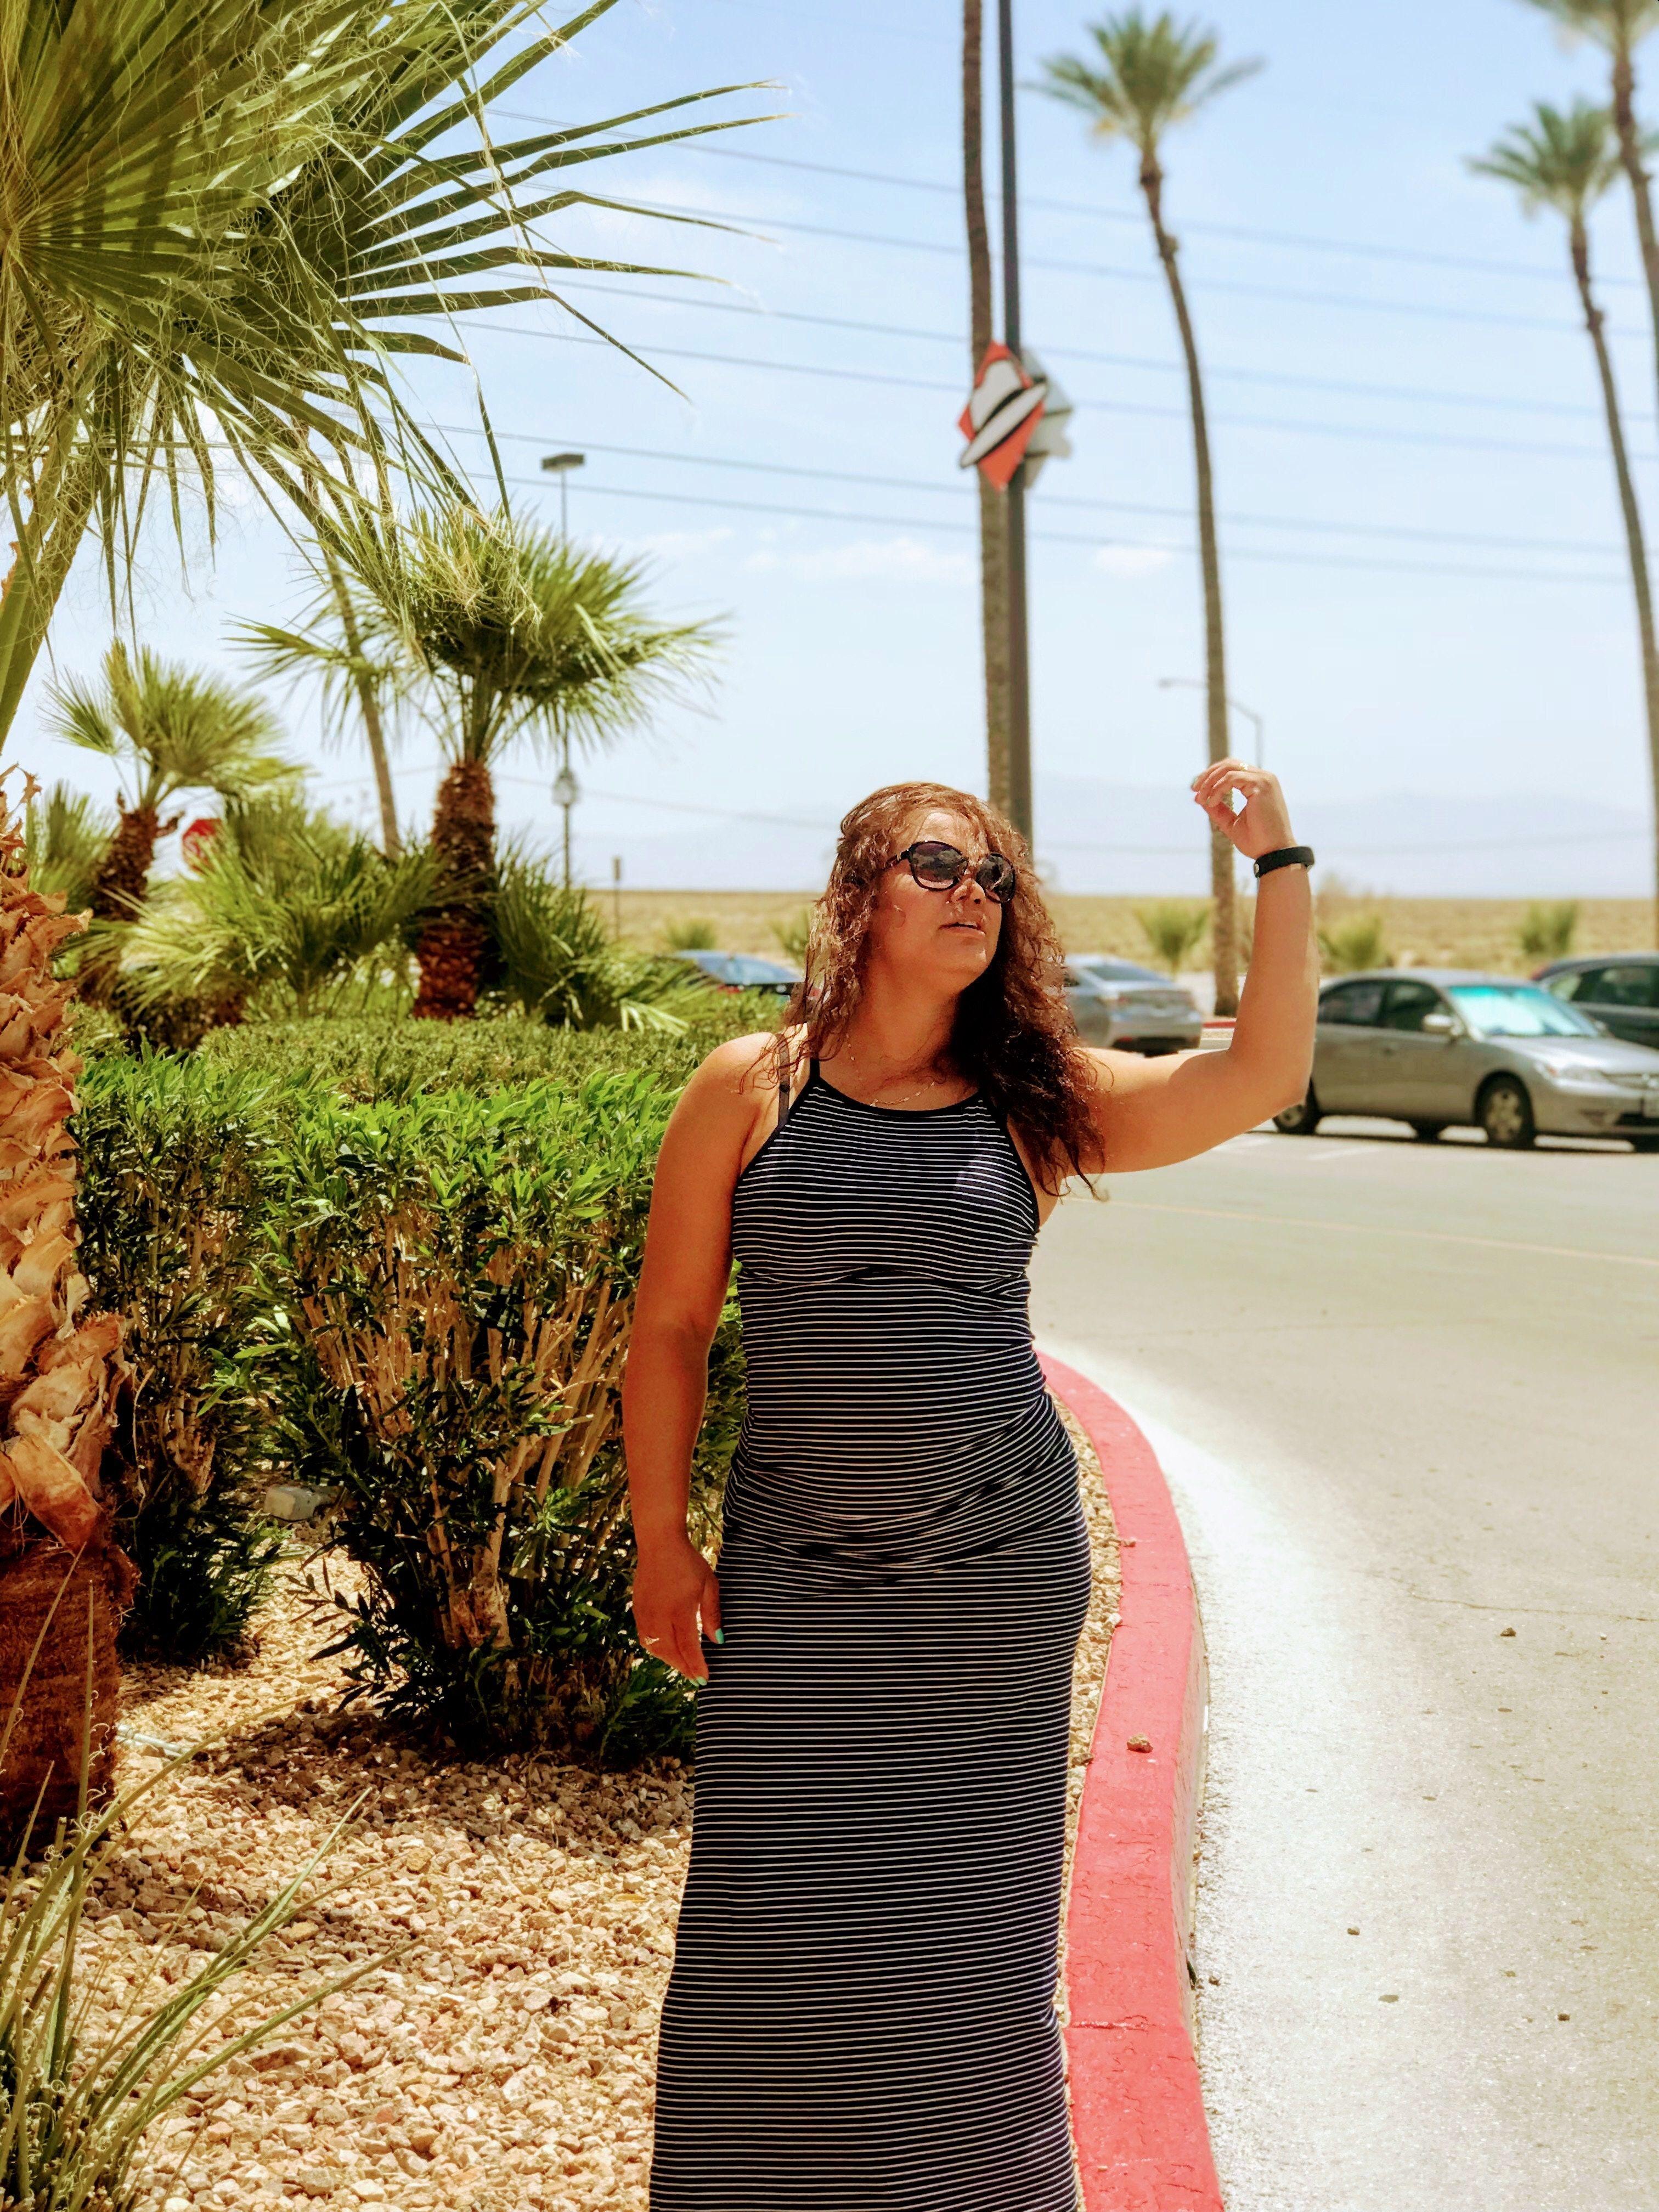 32100 S Las Vegas Blvd Jean United States Apple Iphone 7 Plus 060302 Fashion Design Jobs Fashion Grey Tank Dress